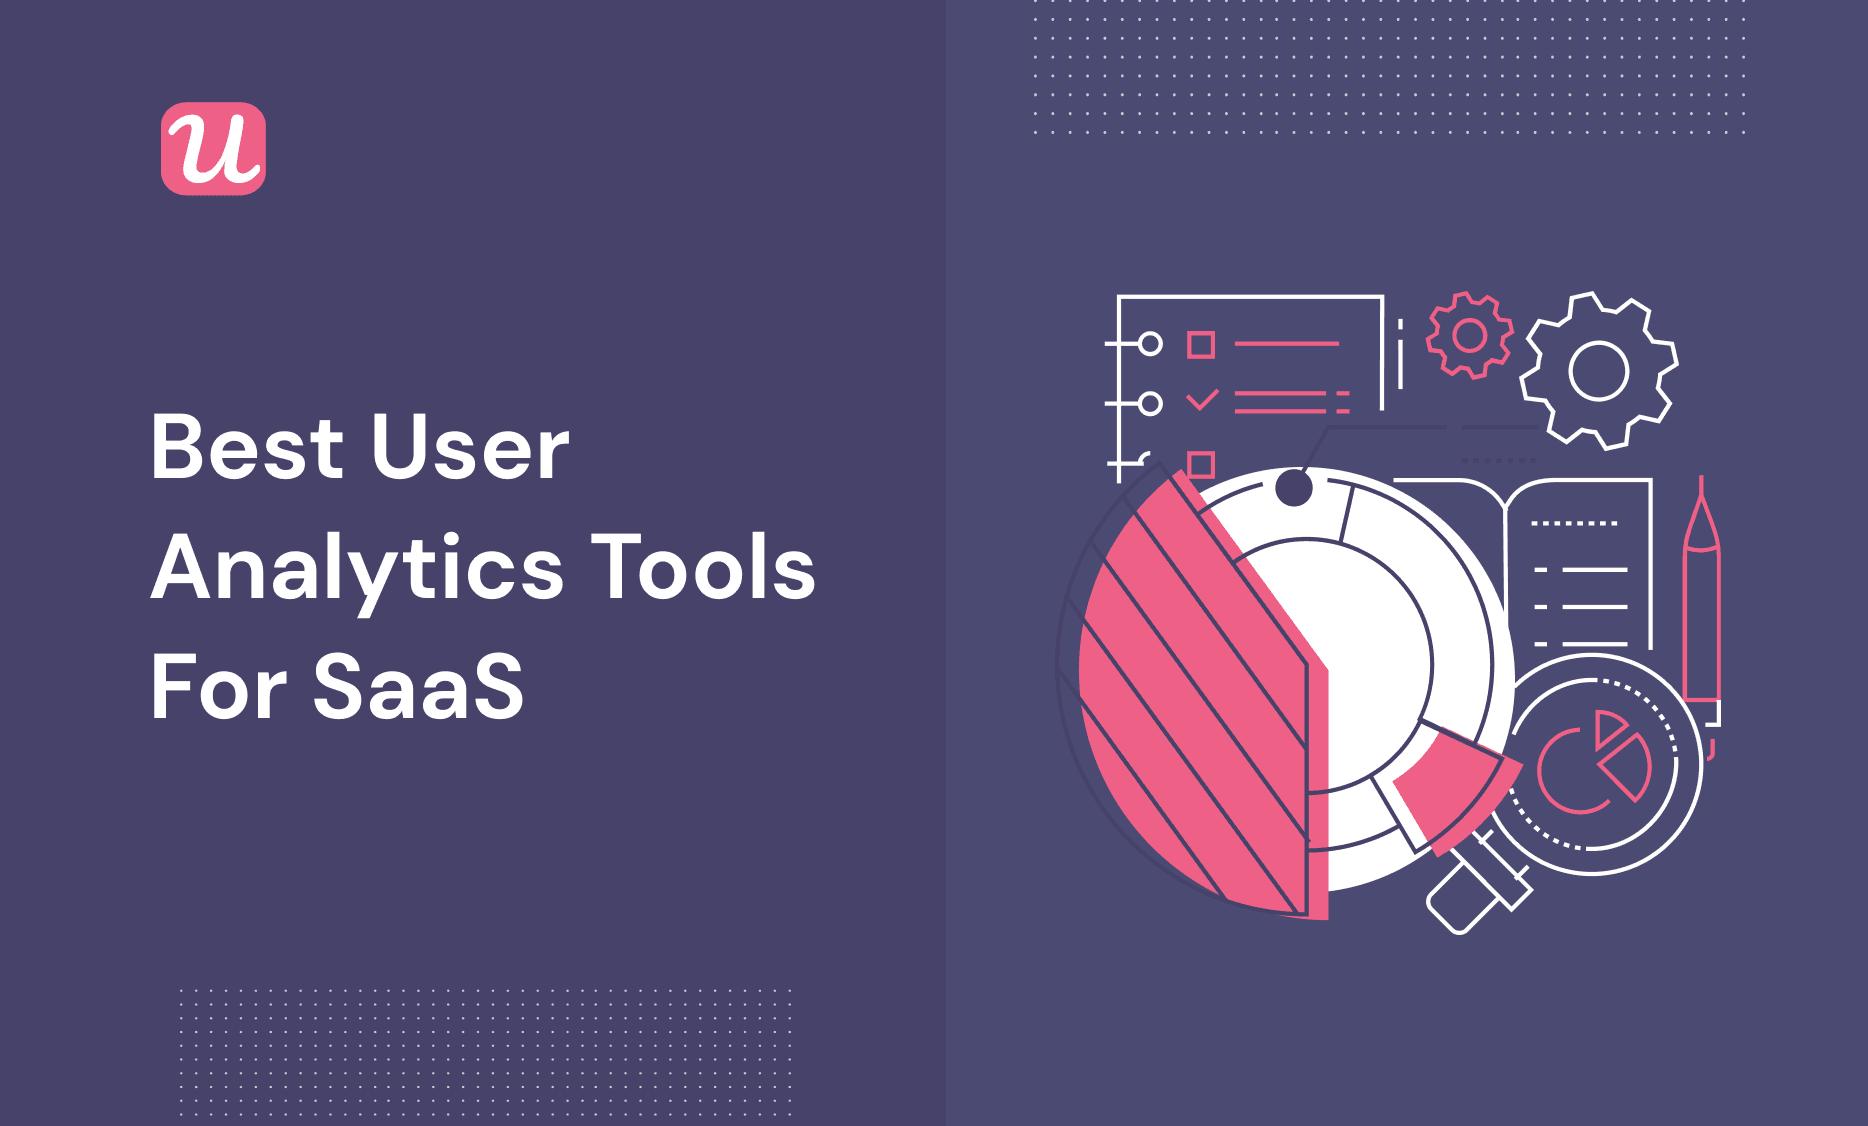 Best user analytics tools for SaaS